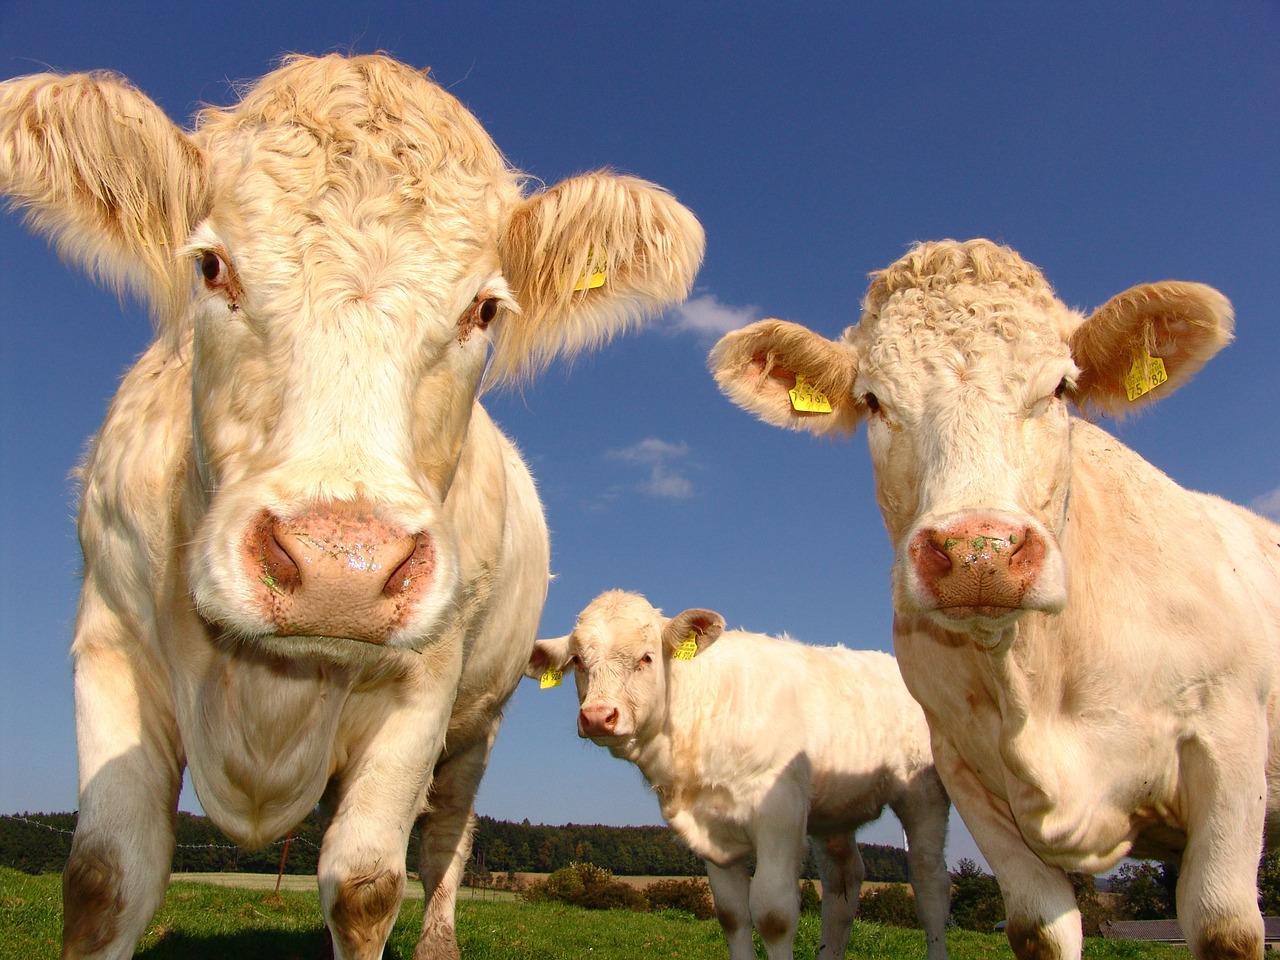 Cows looking at the camera